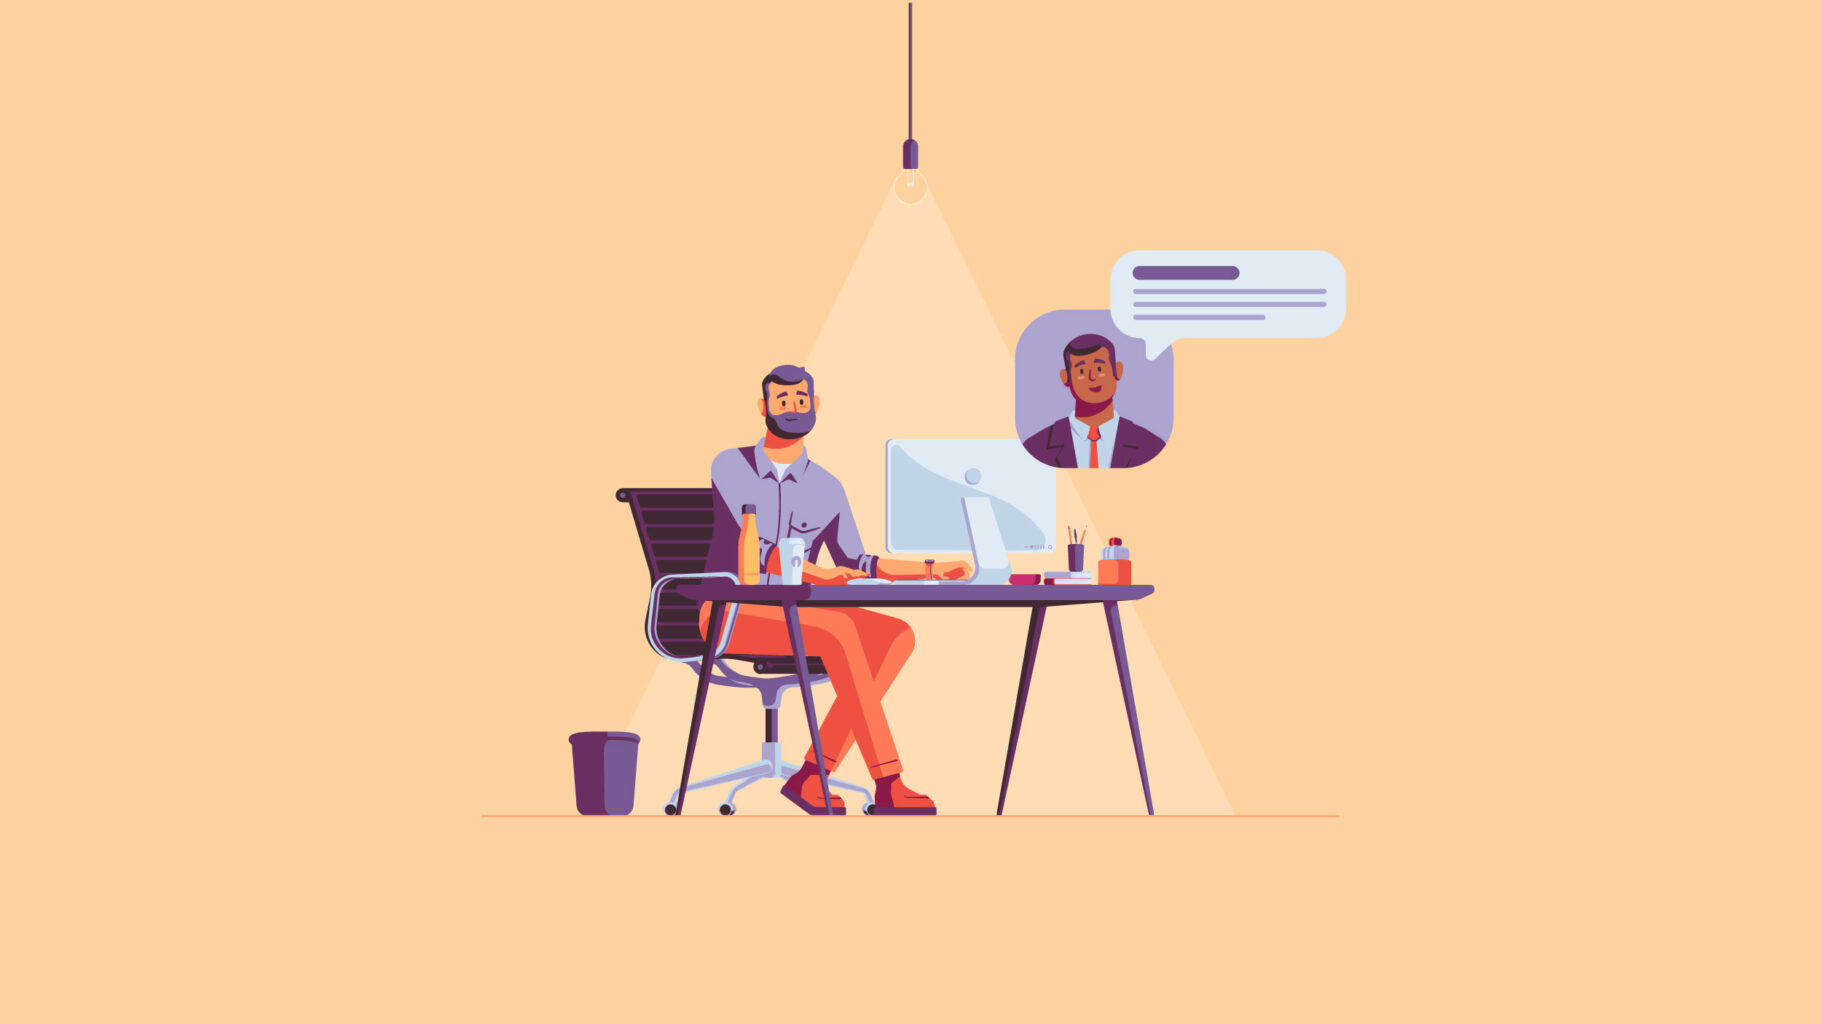 Illustration system home office scene